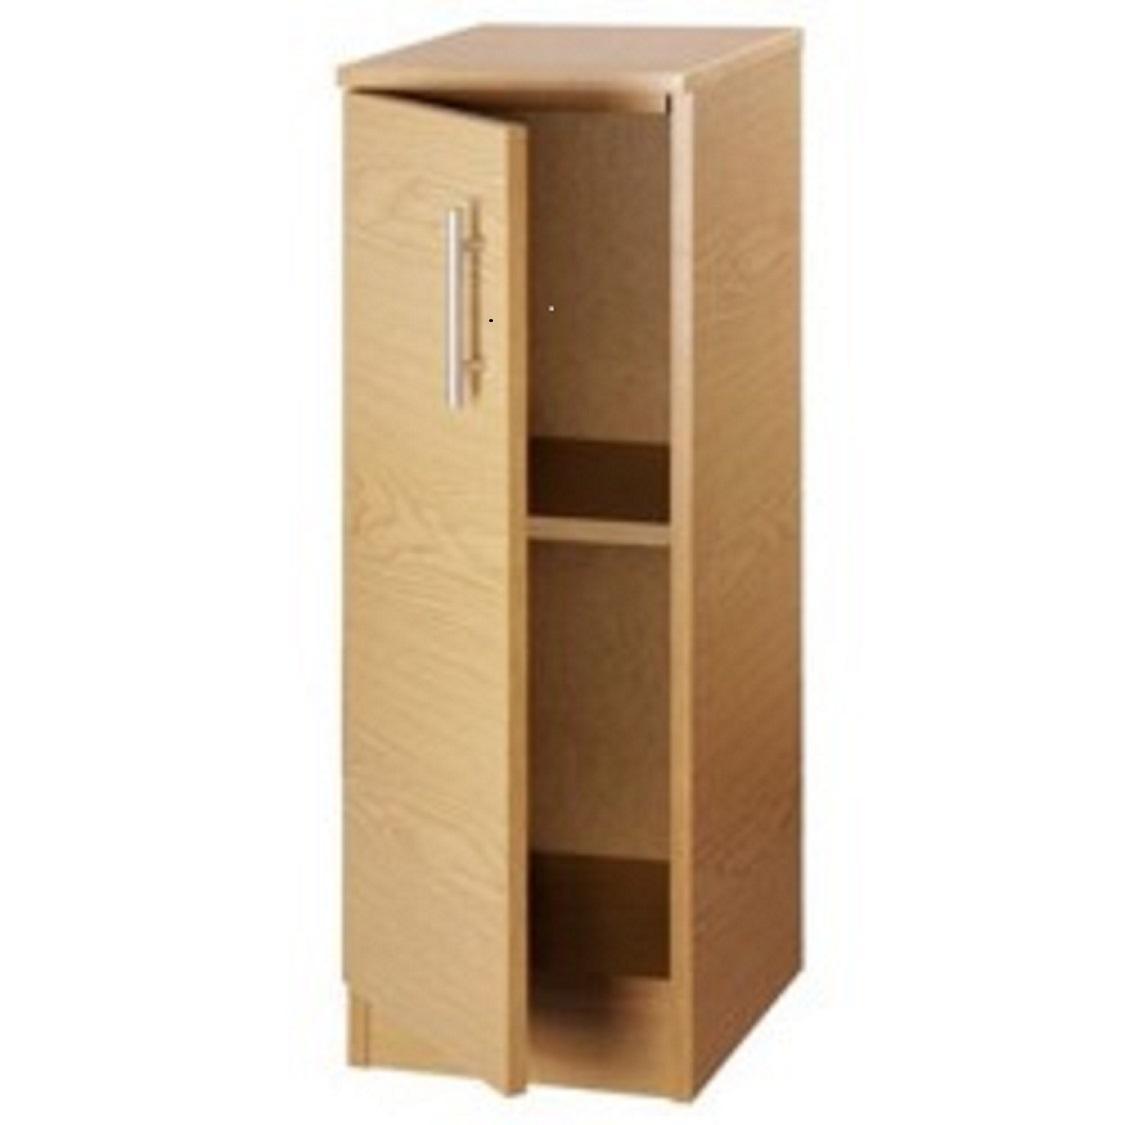 milan freestanding wood bathroom shower furniture cabinet storage unit